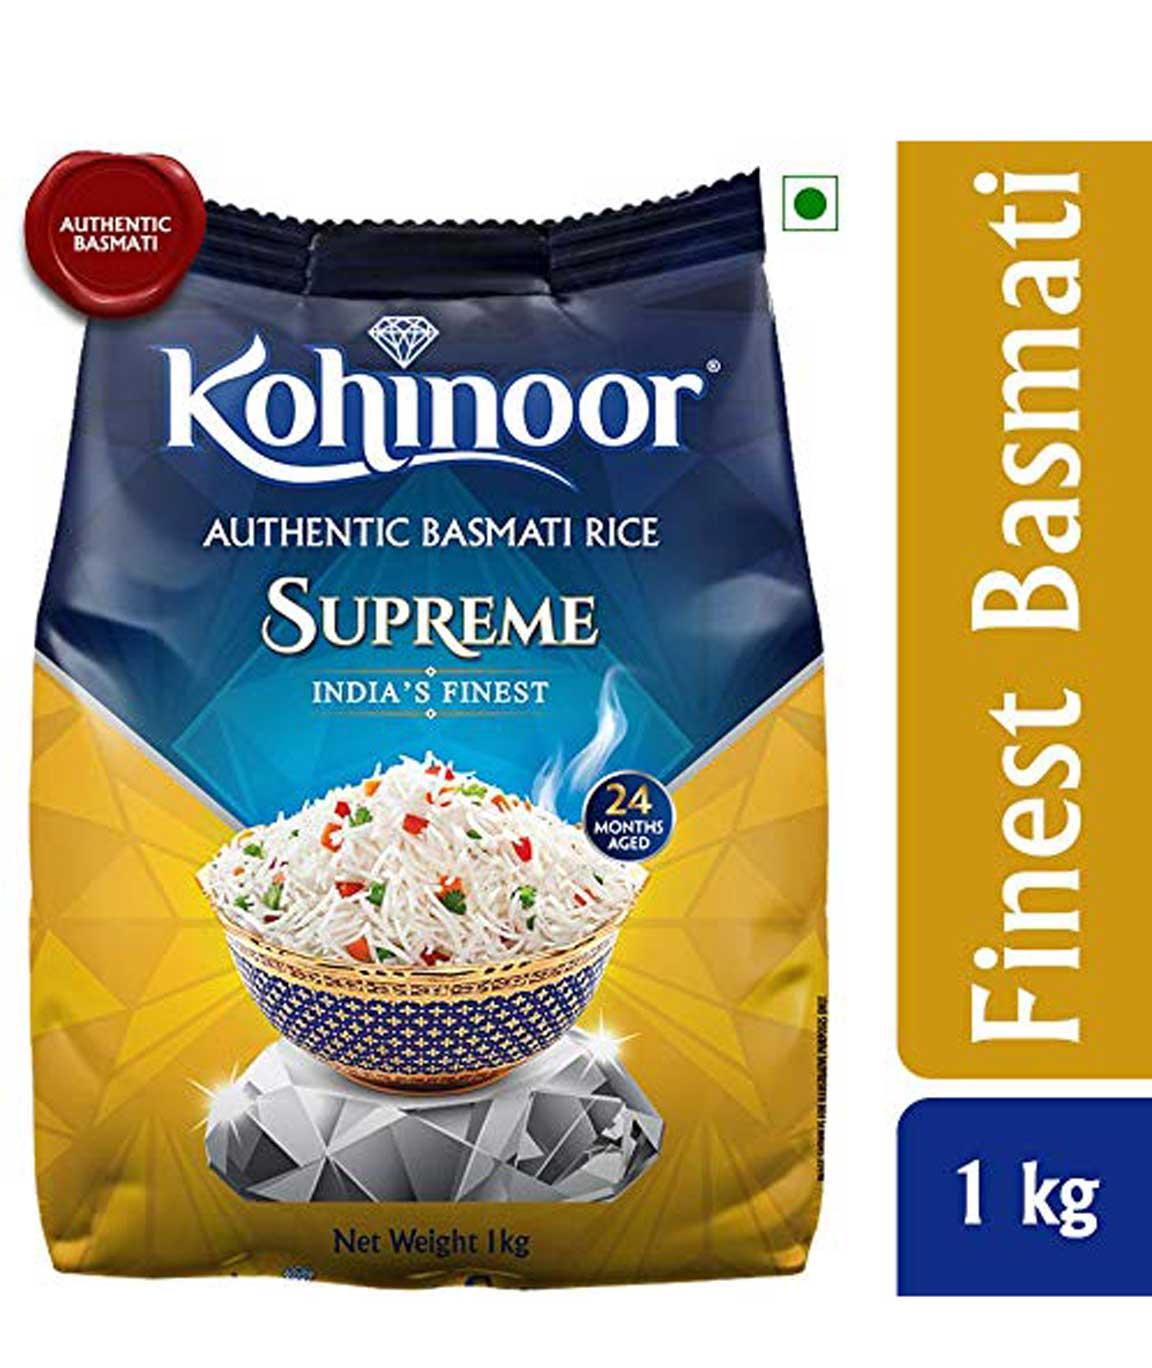 Kohinoor Supreme Authentic Aged Basmati Rice, 1kg